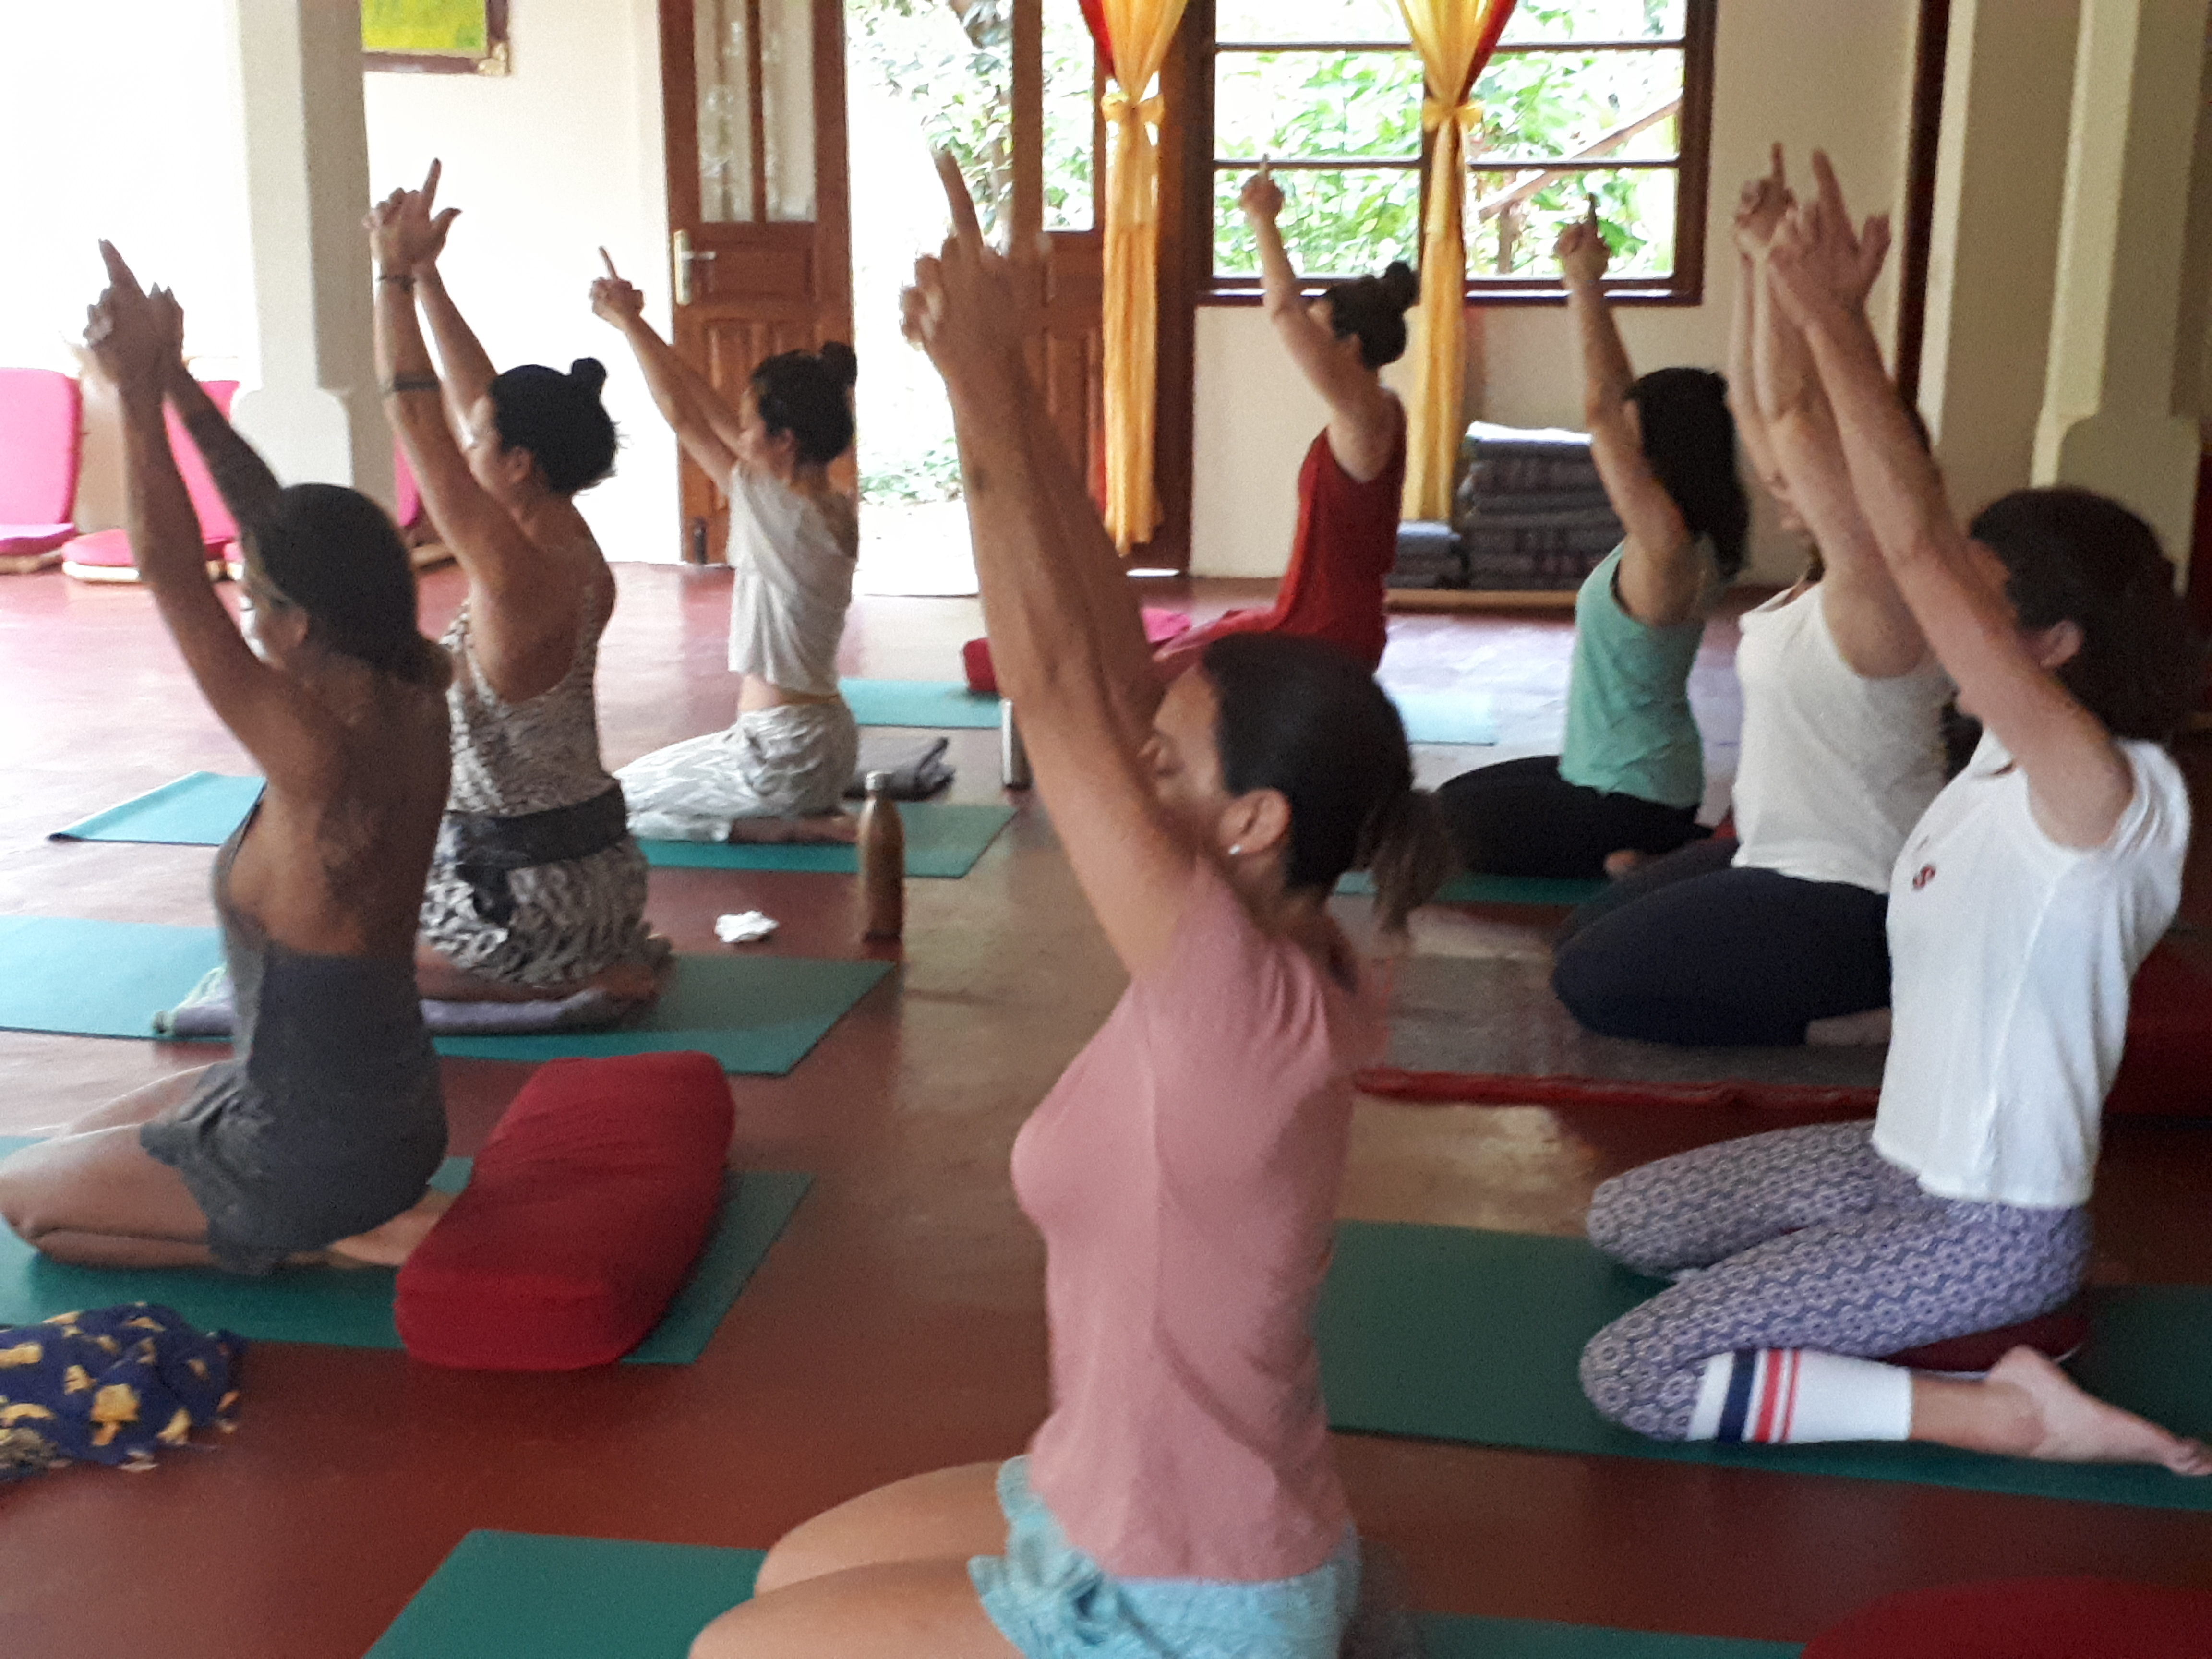 Practice yoga outdoors